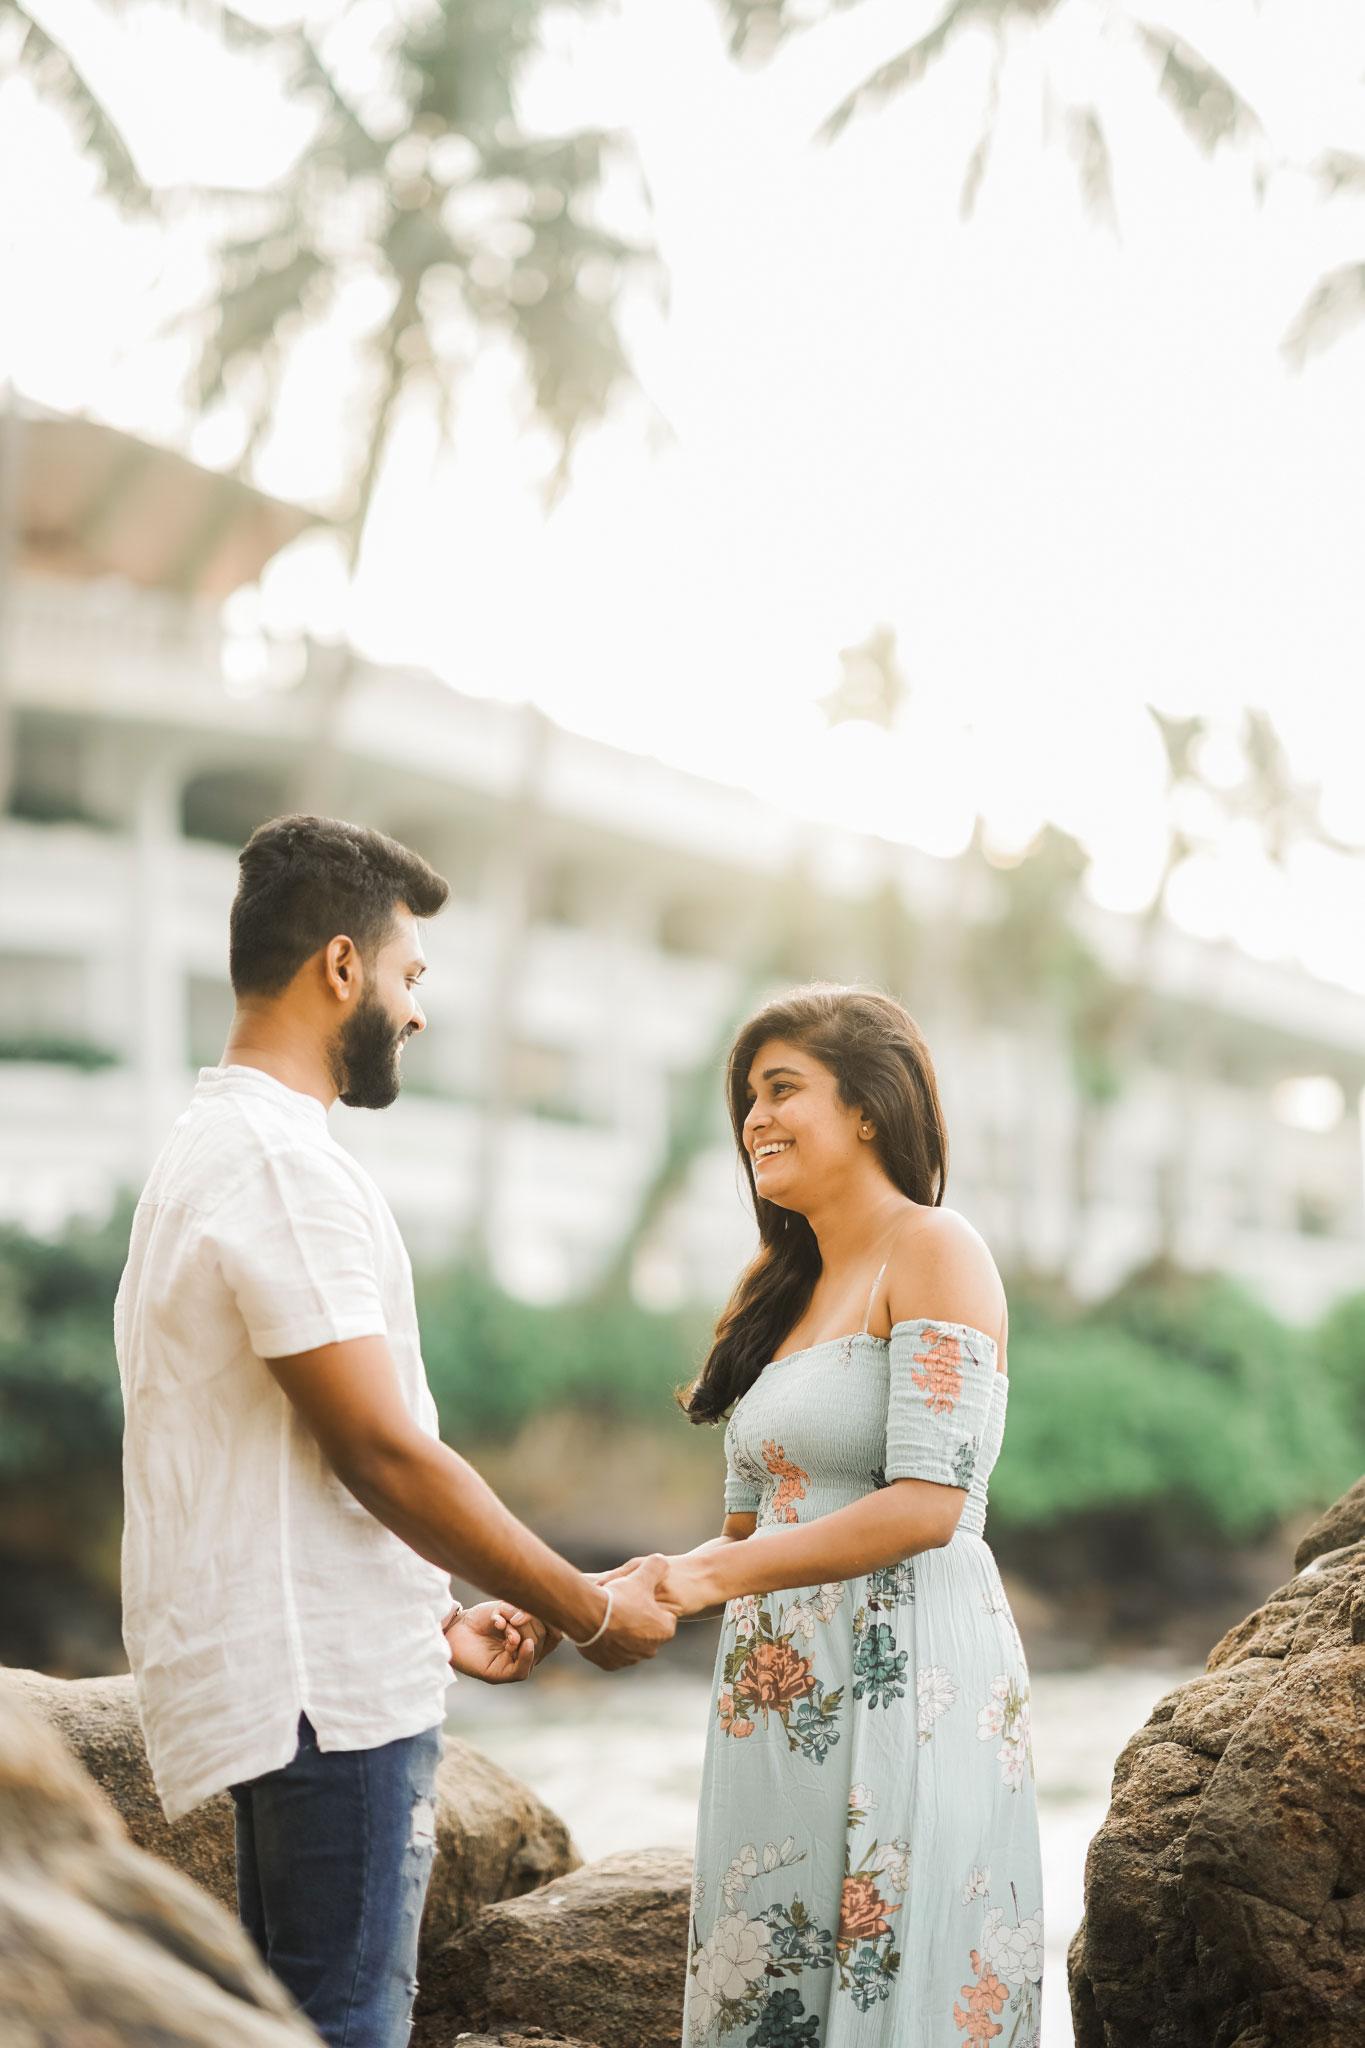 Madushani & Dasun - Prabath Kanishka Wedding Photography